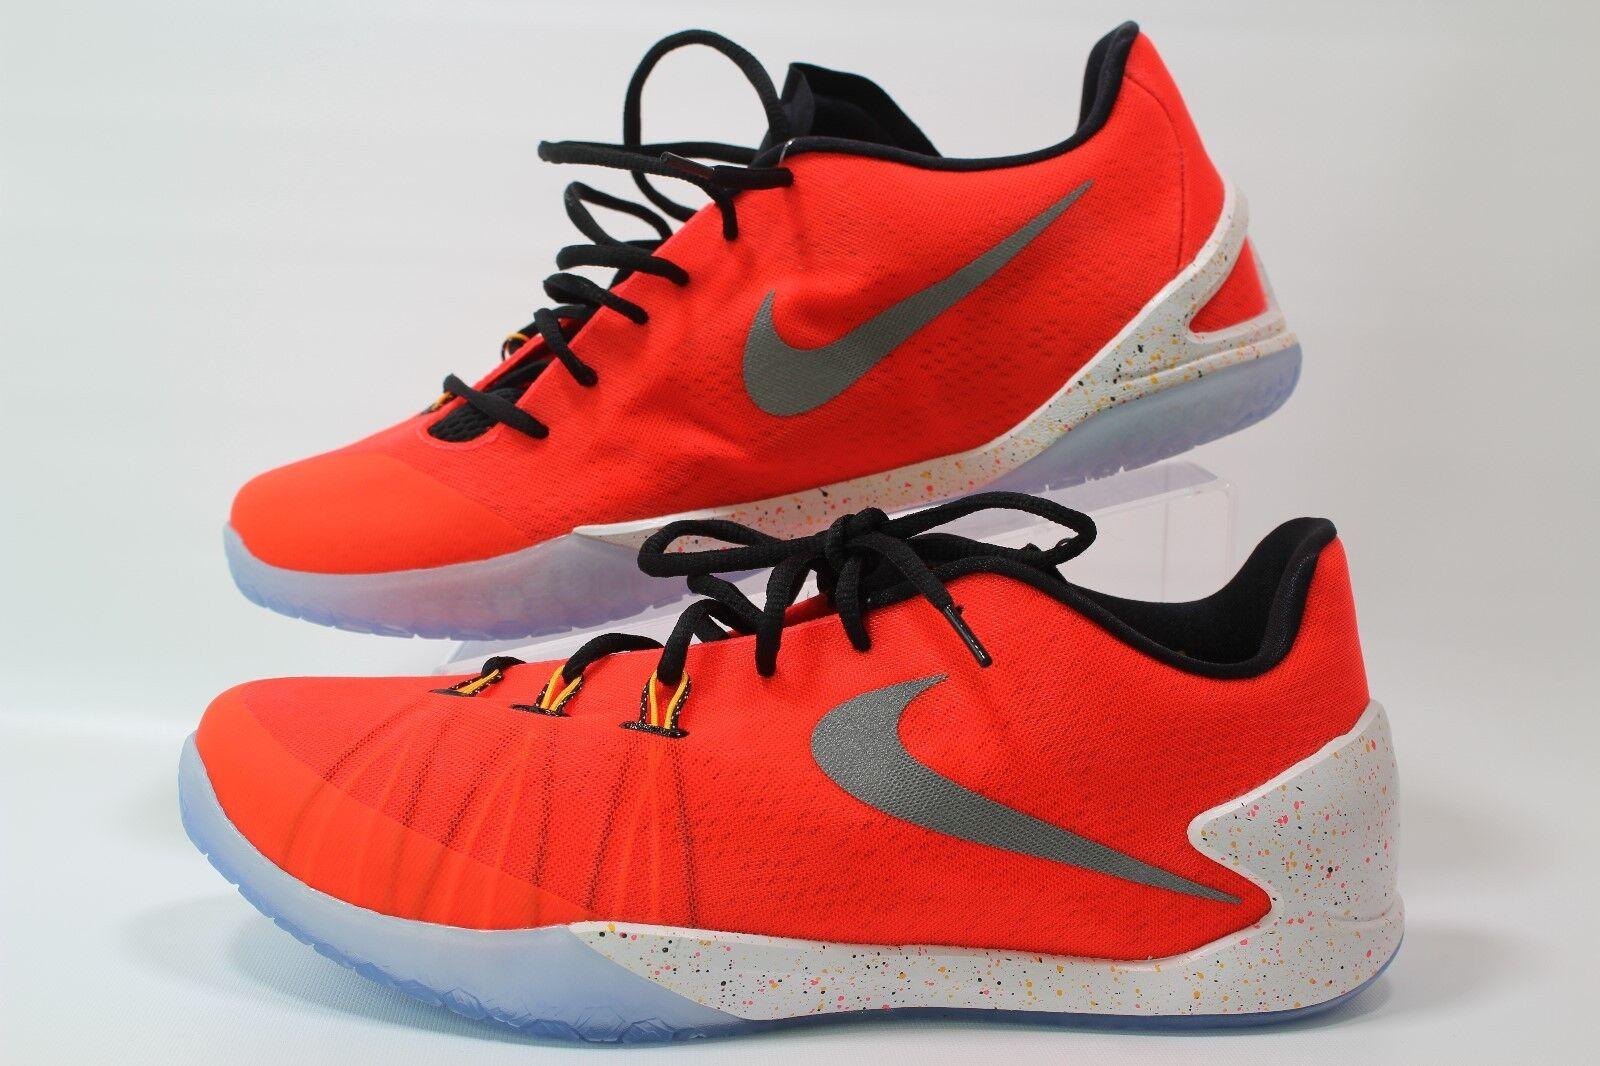 Nike Hyperchase Premium Men's Basketball Shoes Crimson Red 705369 601 Size 13